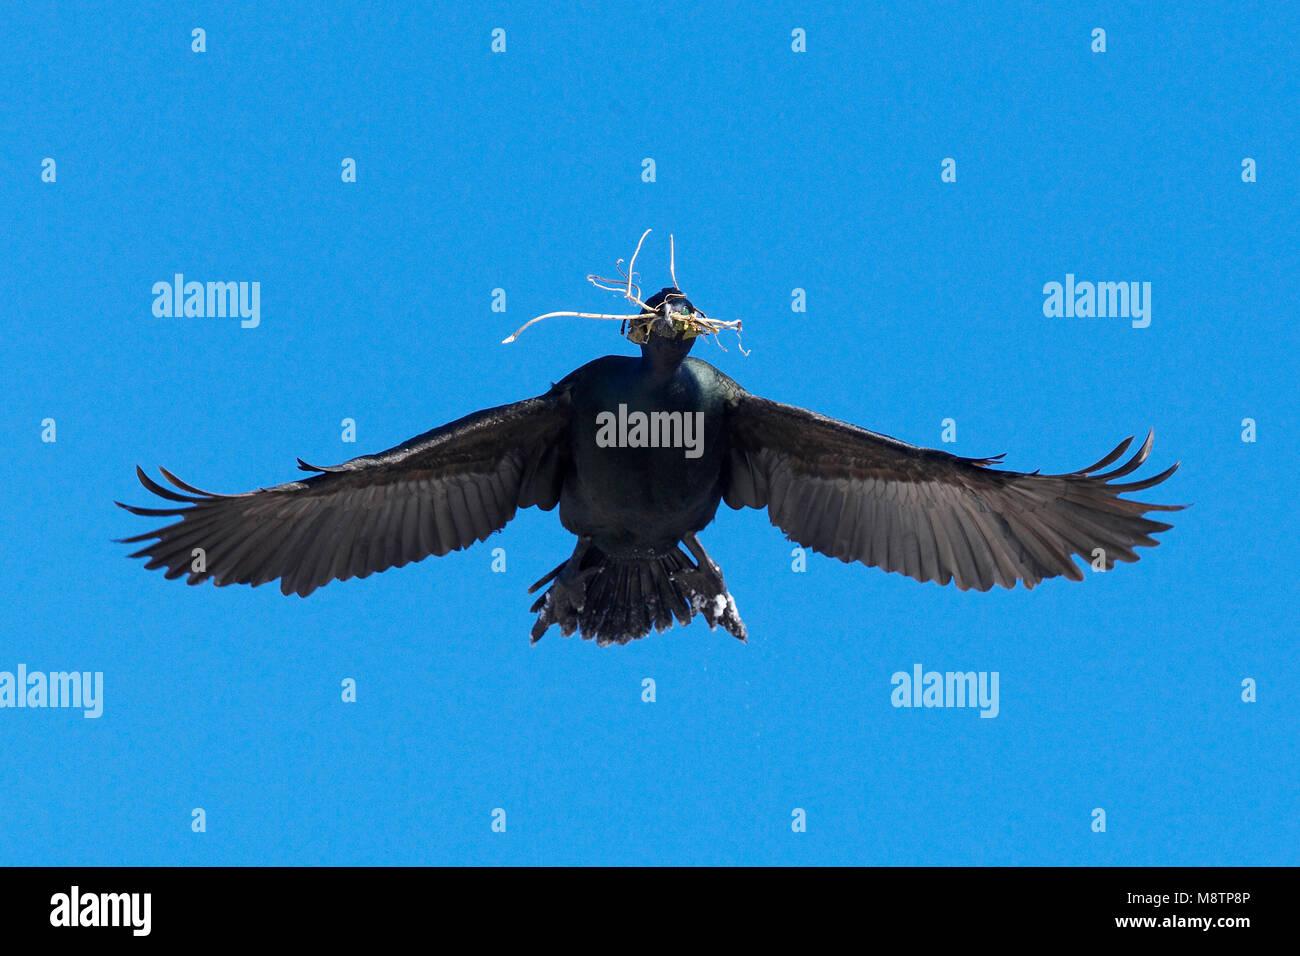 Kuifaalscholver vliegend met nestmateriaal; European Shag flying with nesting material - Stock Image